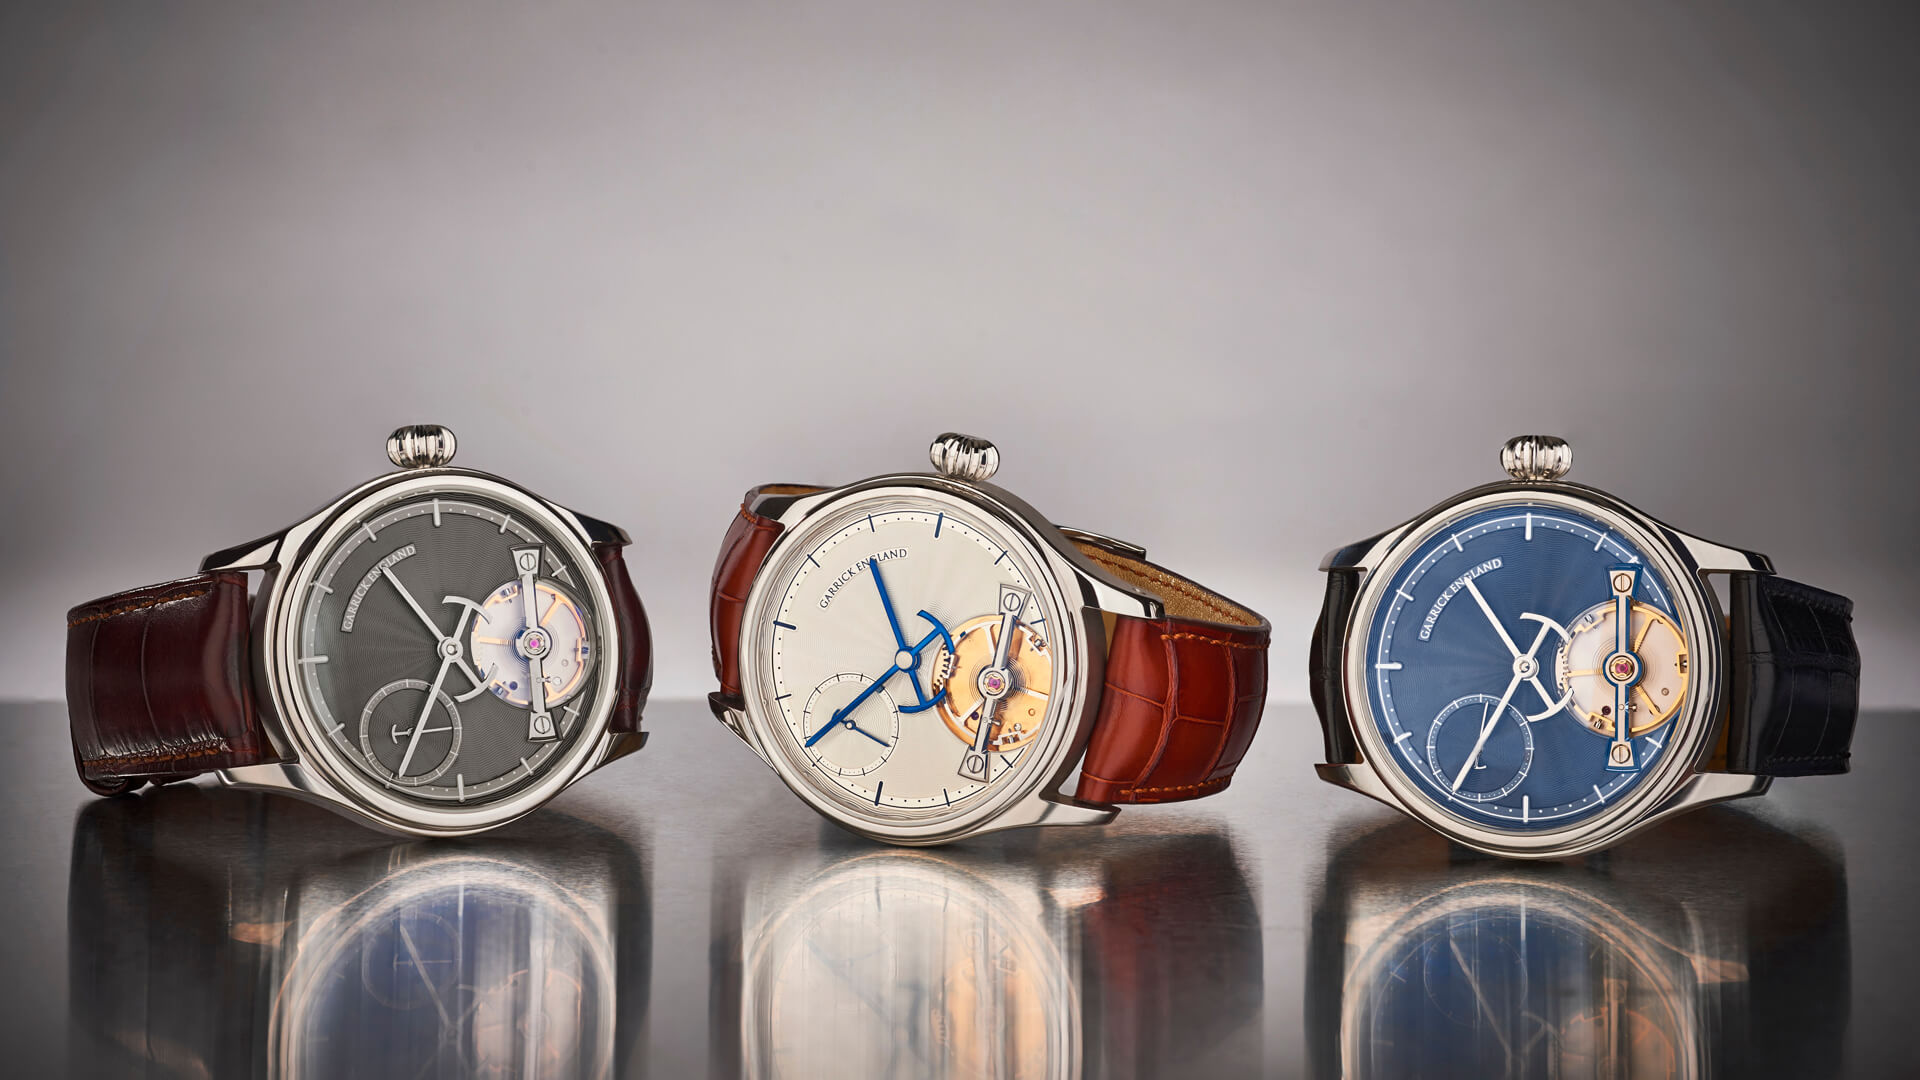 Garrick English watches